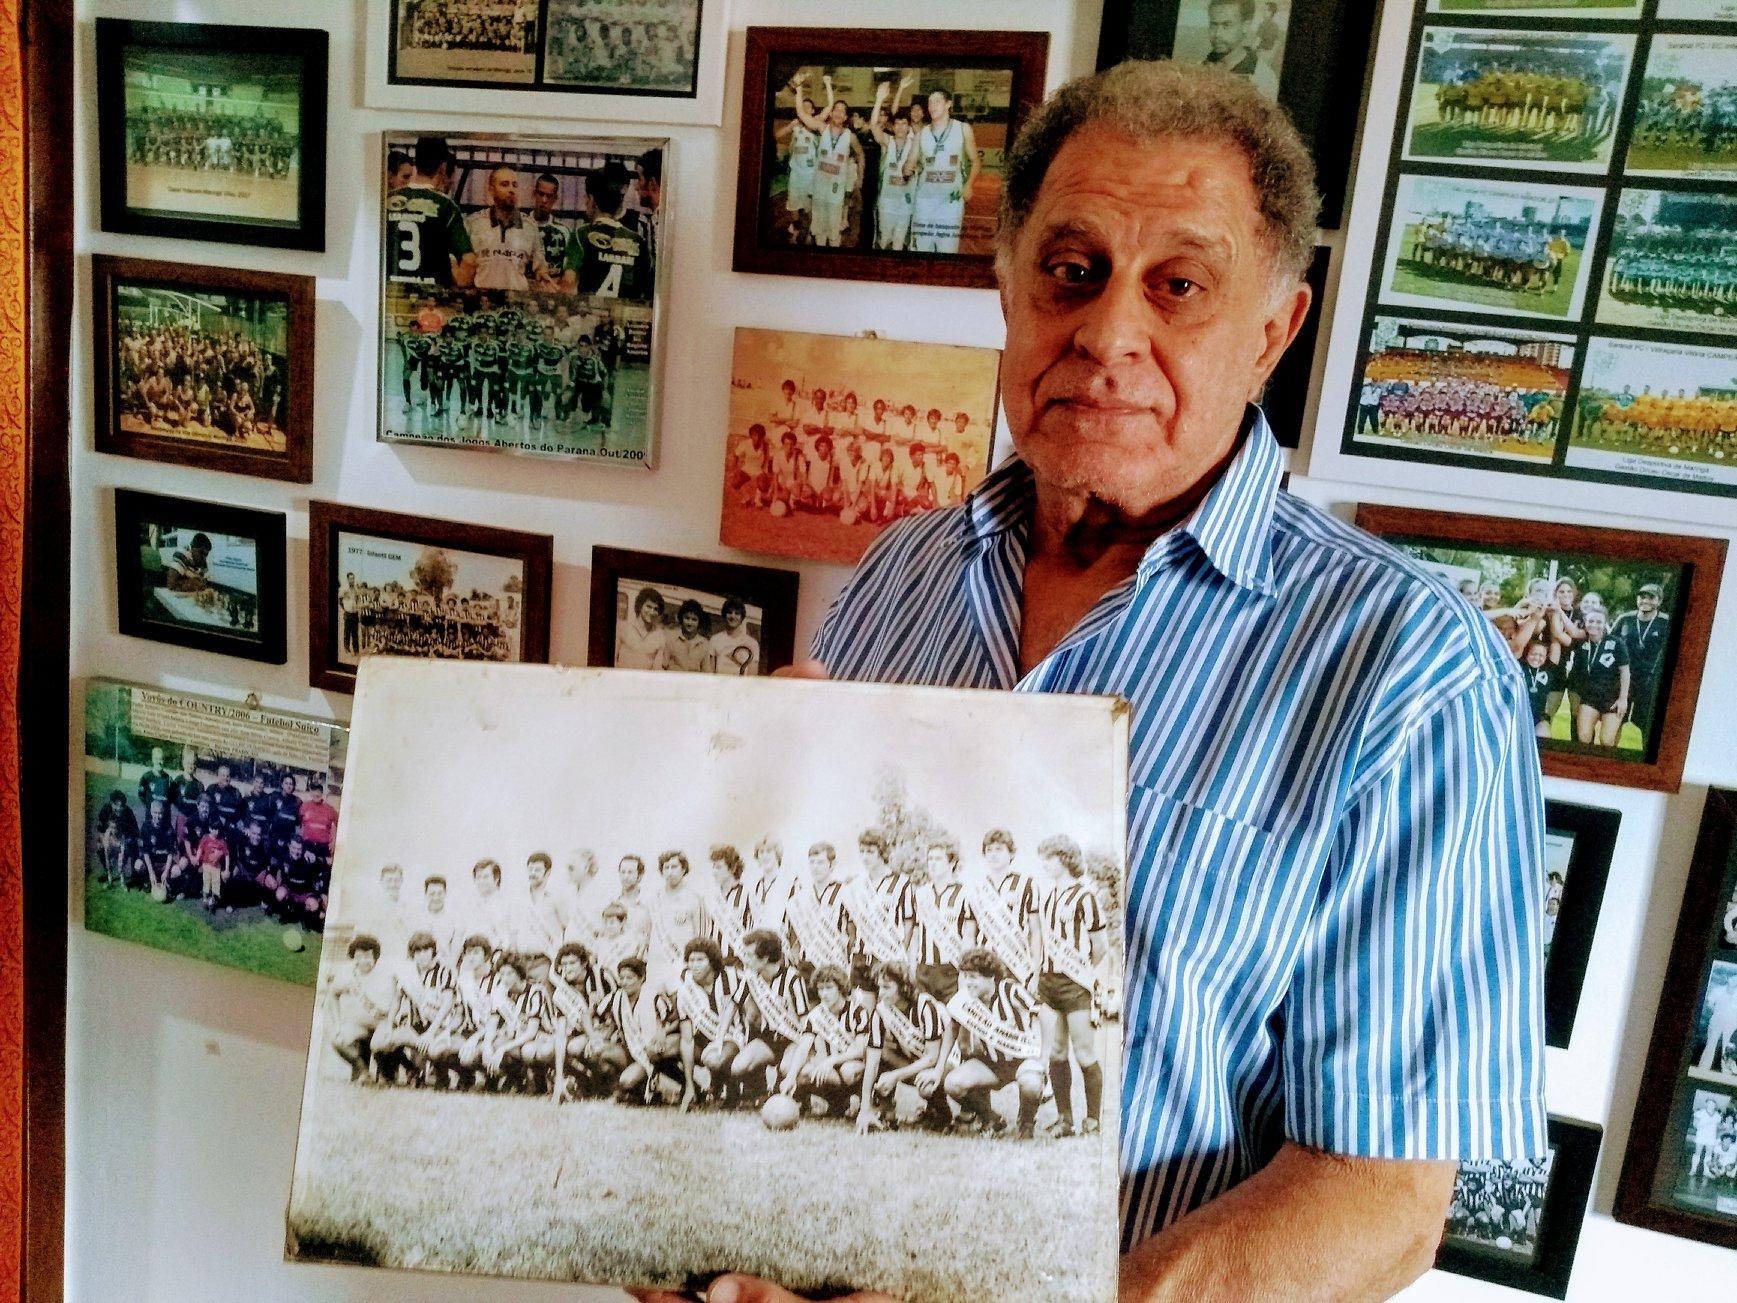 Gabriel Kara Neto visita o Museu Esportivo de Maringá